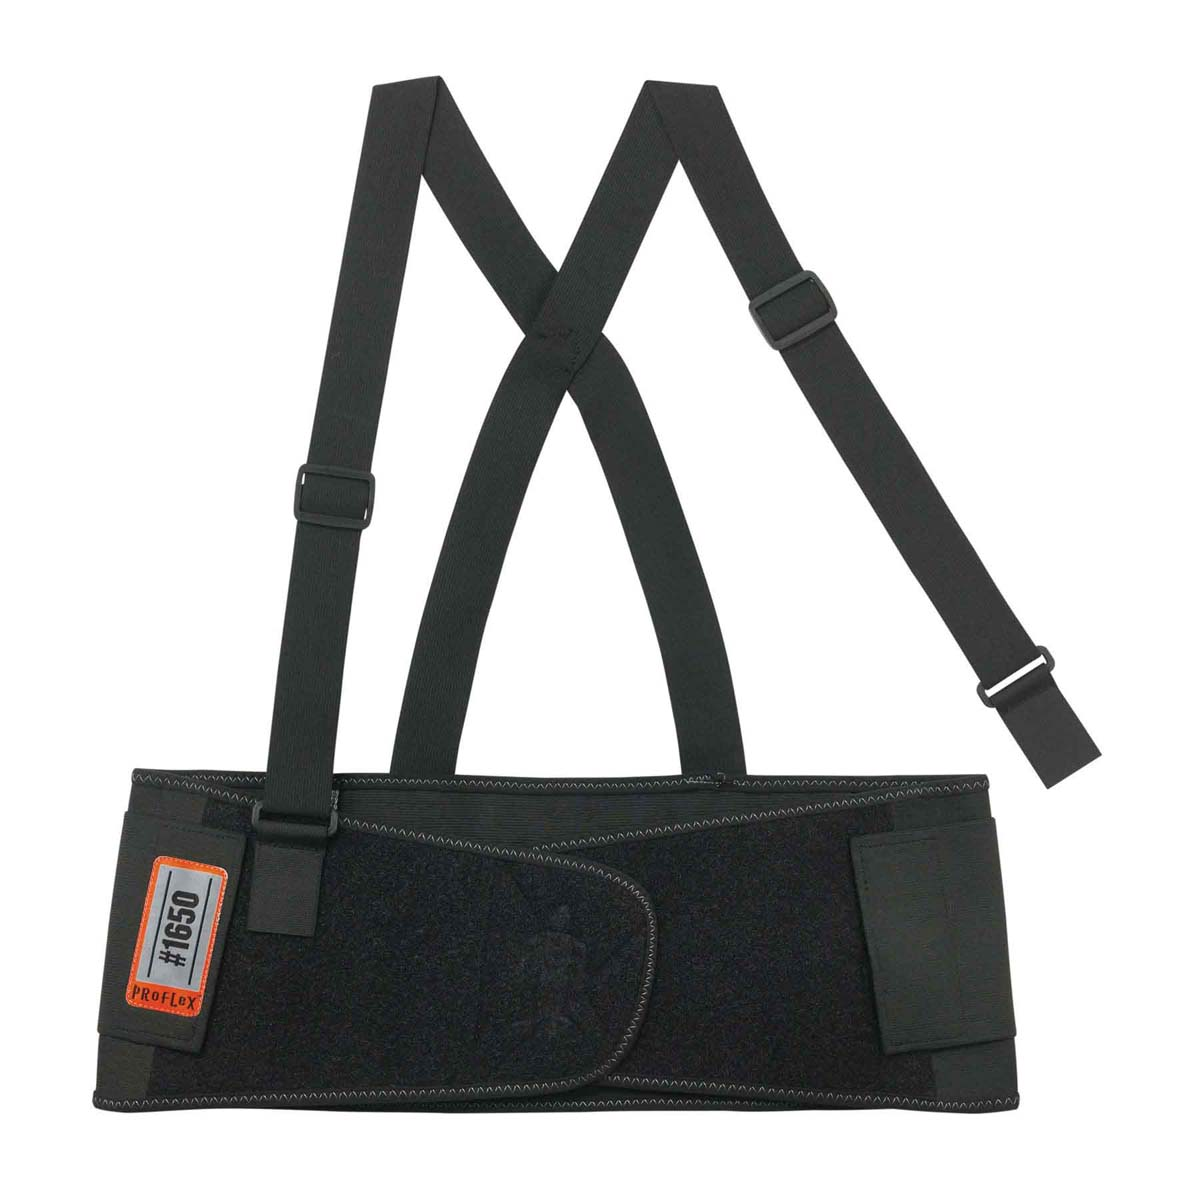 1650 XL Black Economy Elastic Back Support